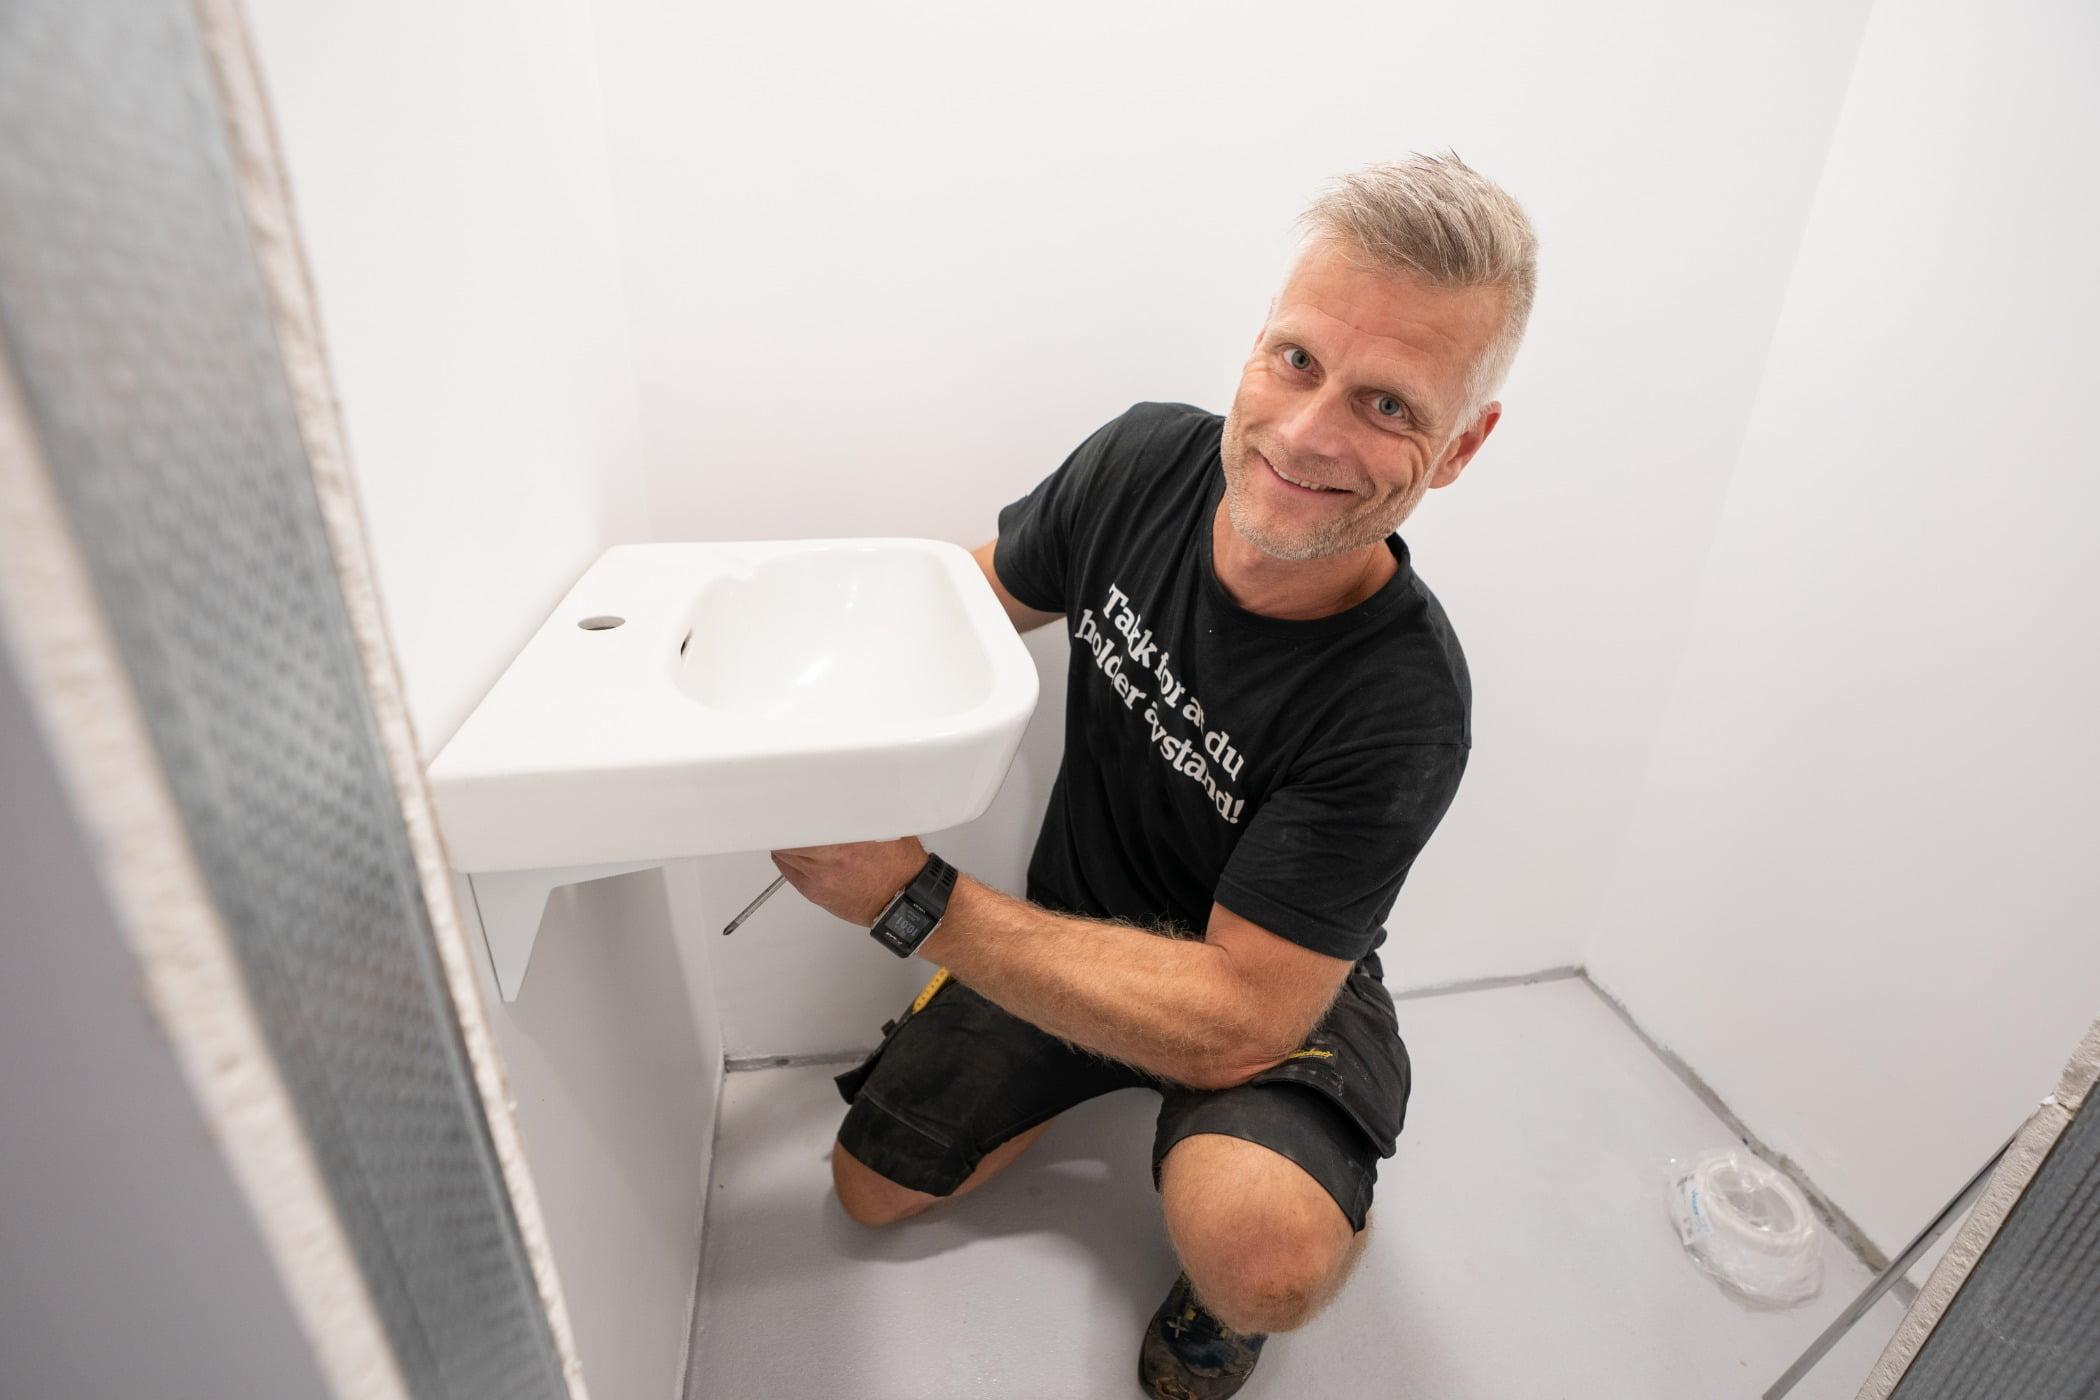 Plumbing fixture, Automotive design, Shoe, Shoulder, Leg, Shorts, Smile, Bathroom, Elbow, Floor